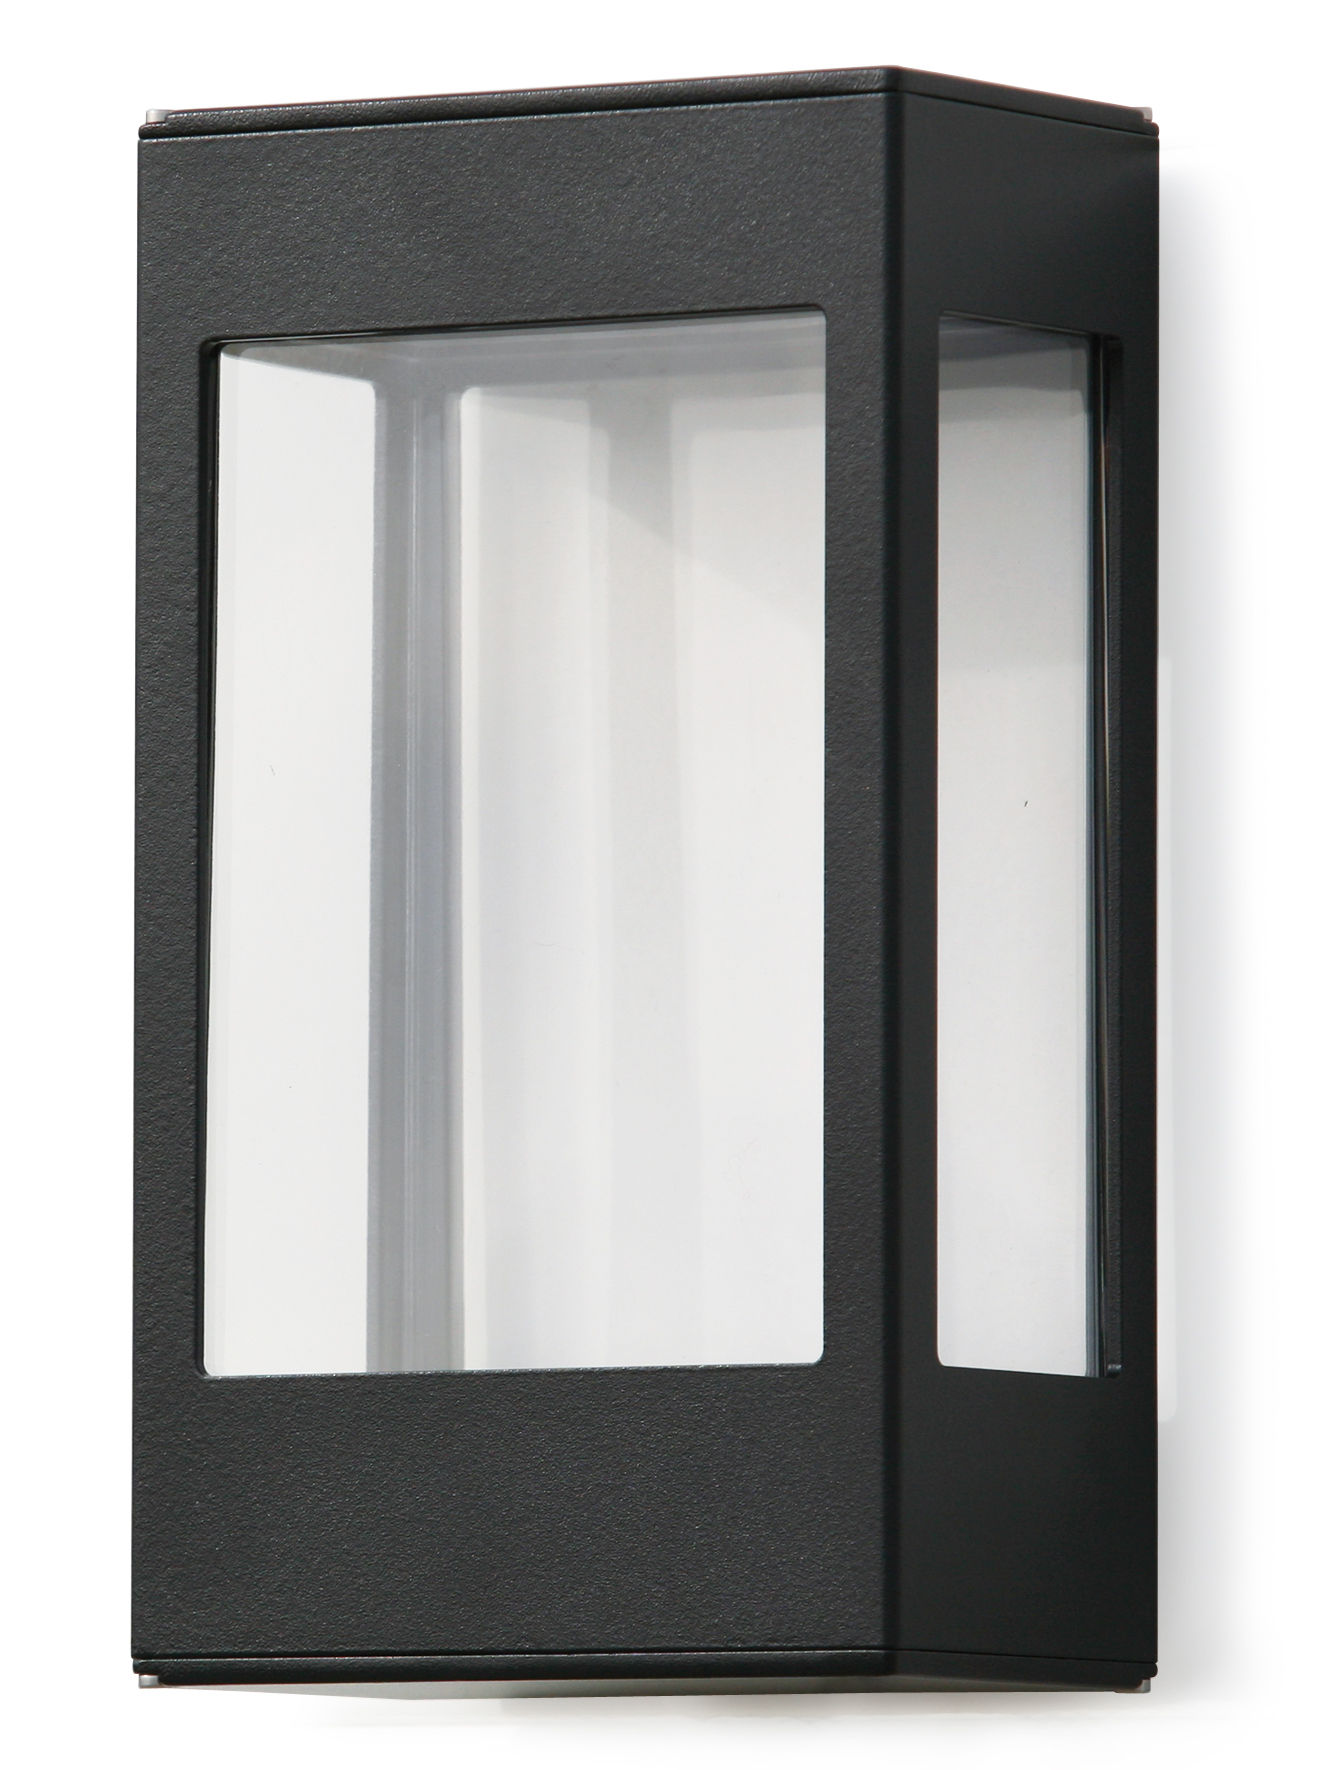 Tetra Wall Light Black By Roger Pradier